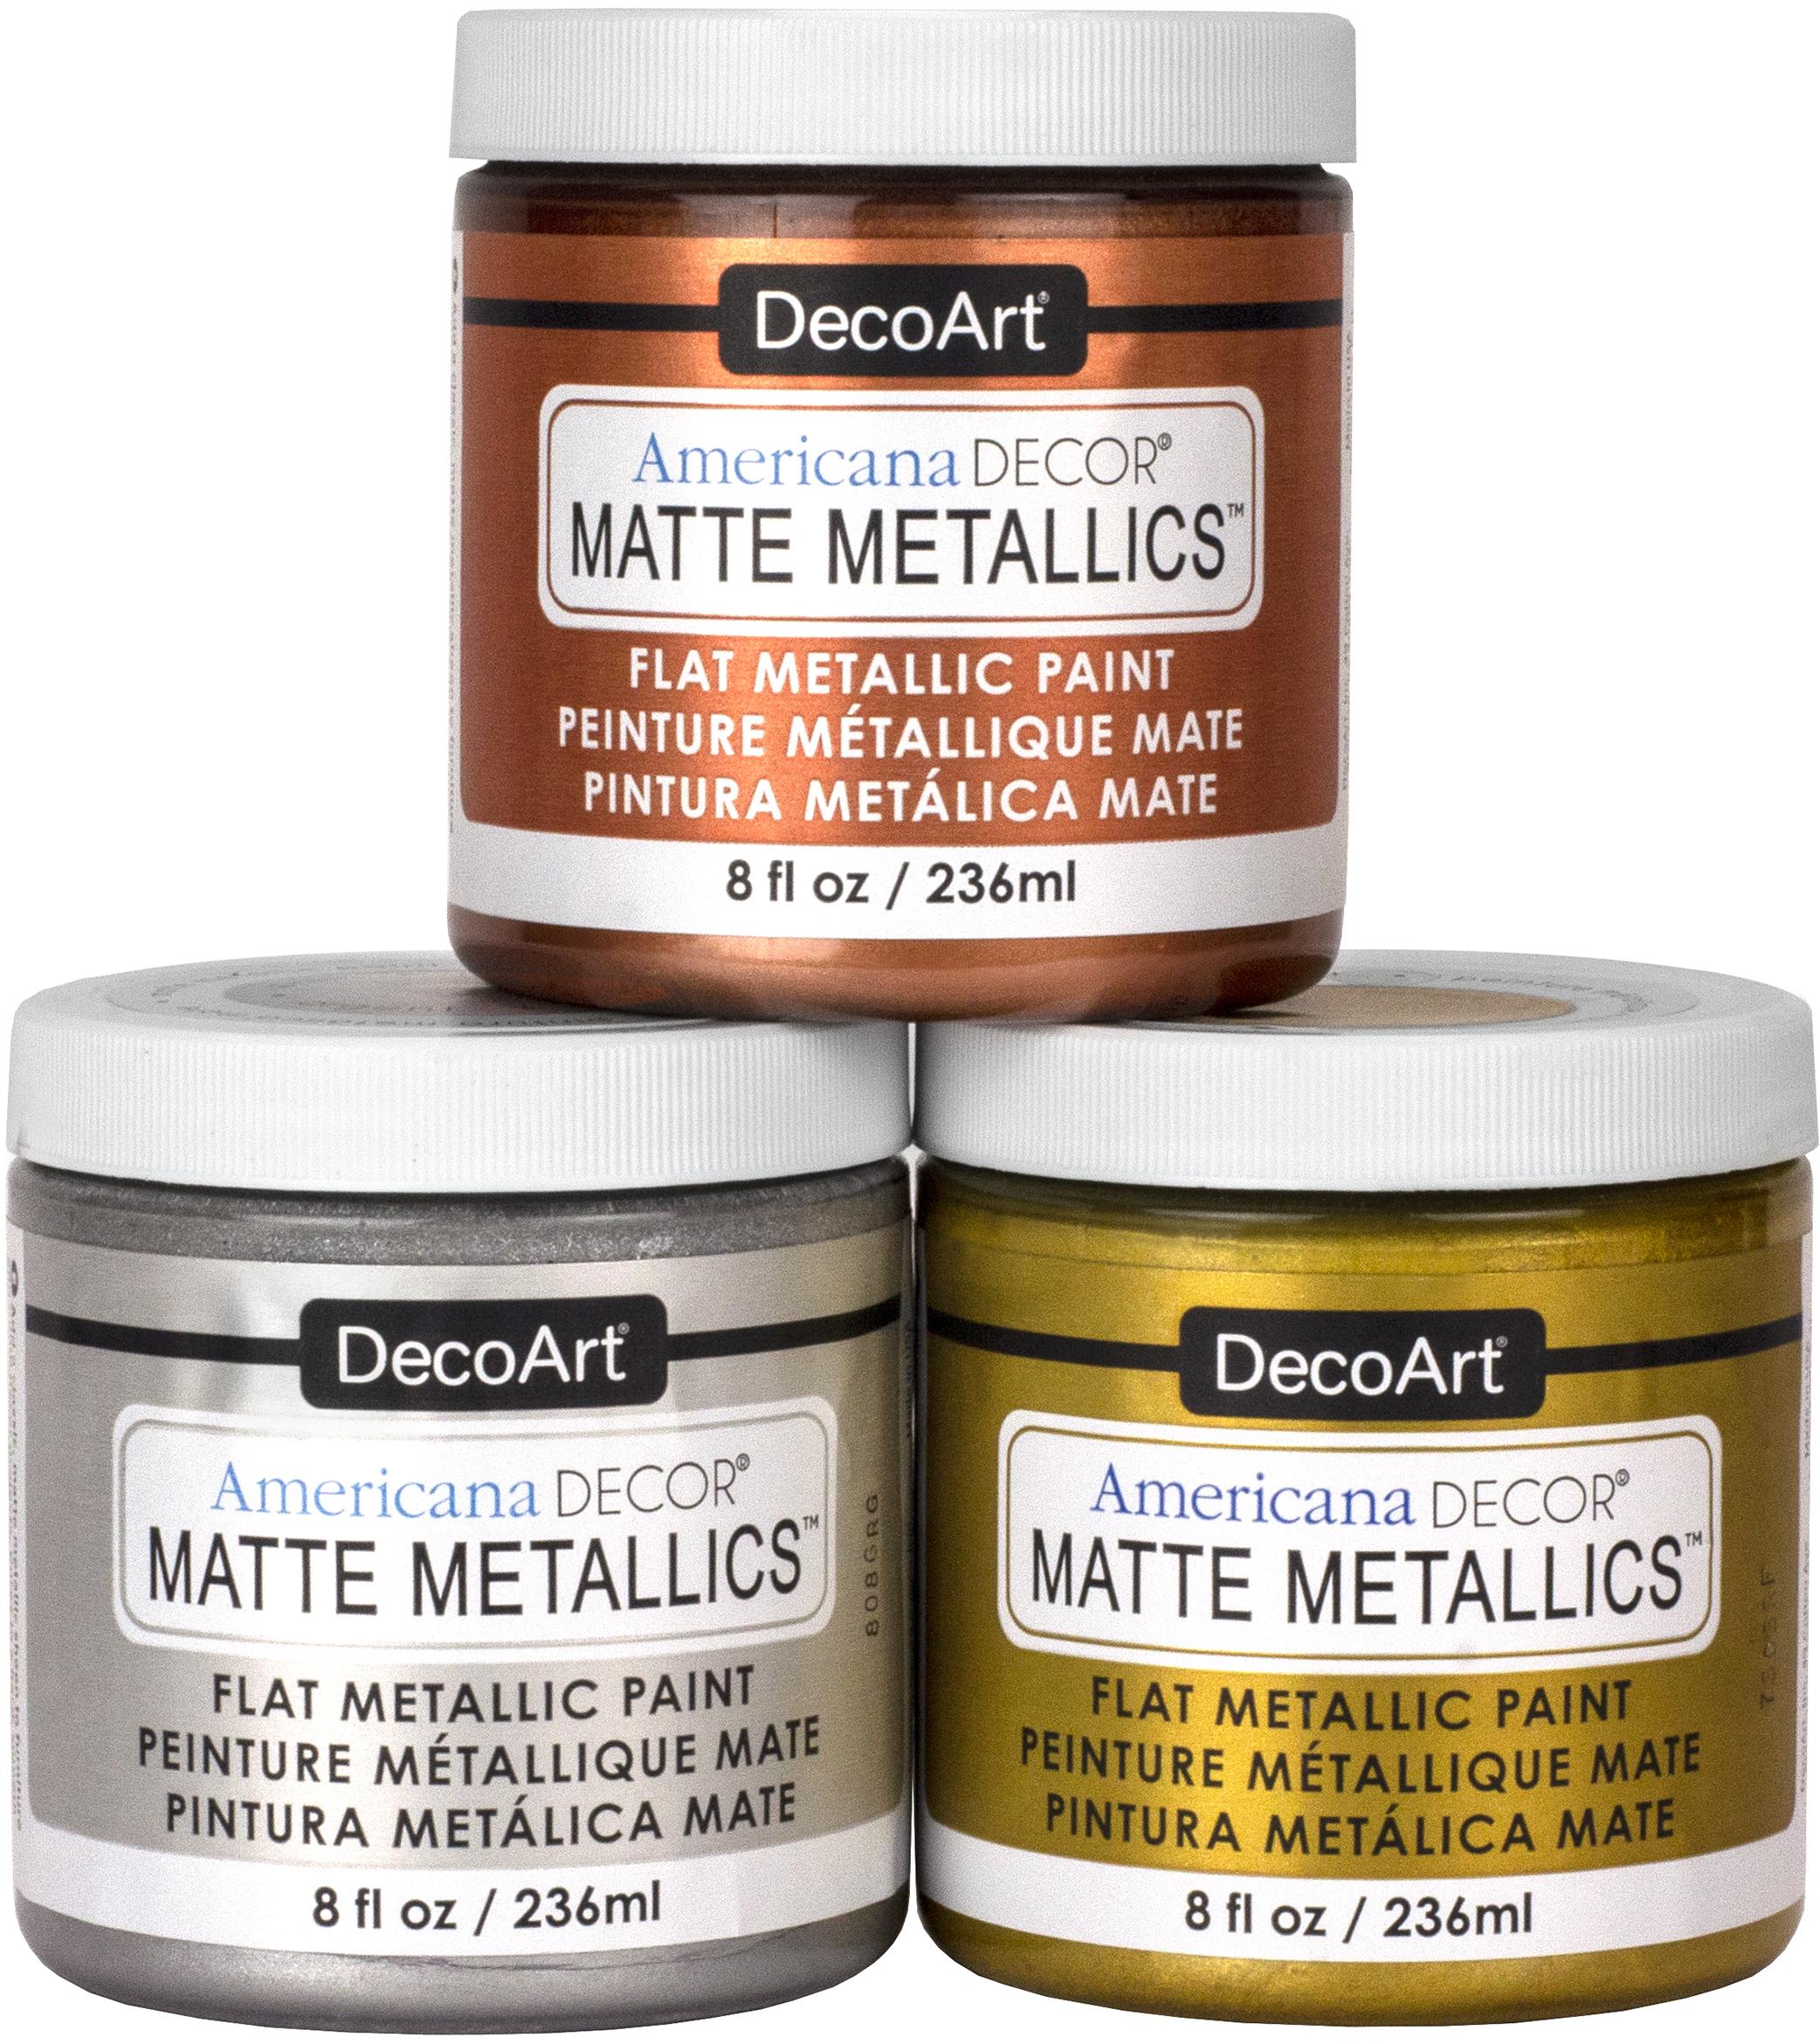 Americana Decor Matte Metallics Product Image